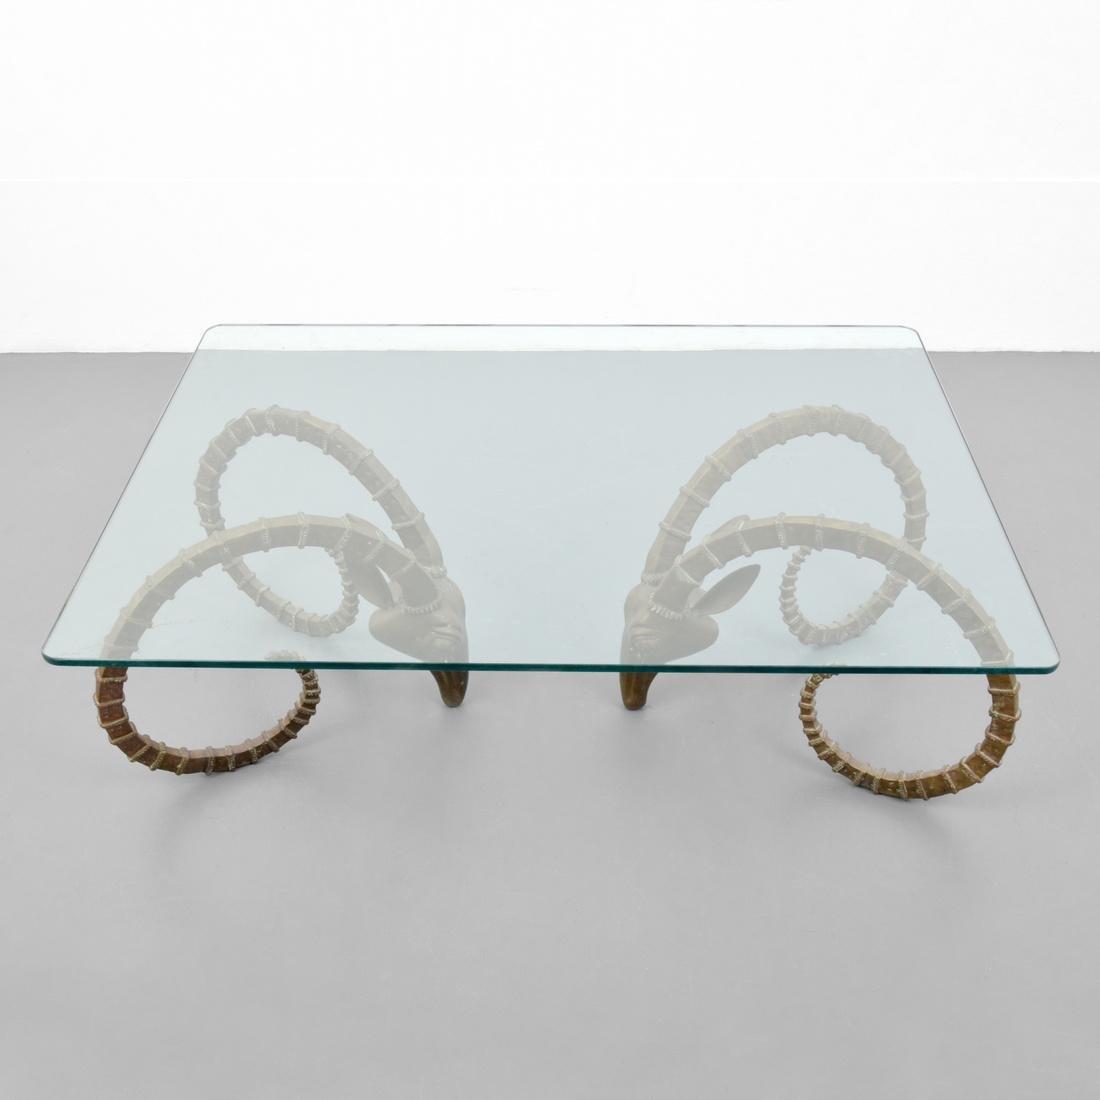 Ibex Coffee Table, Manner of Alain Chervet - 5